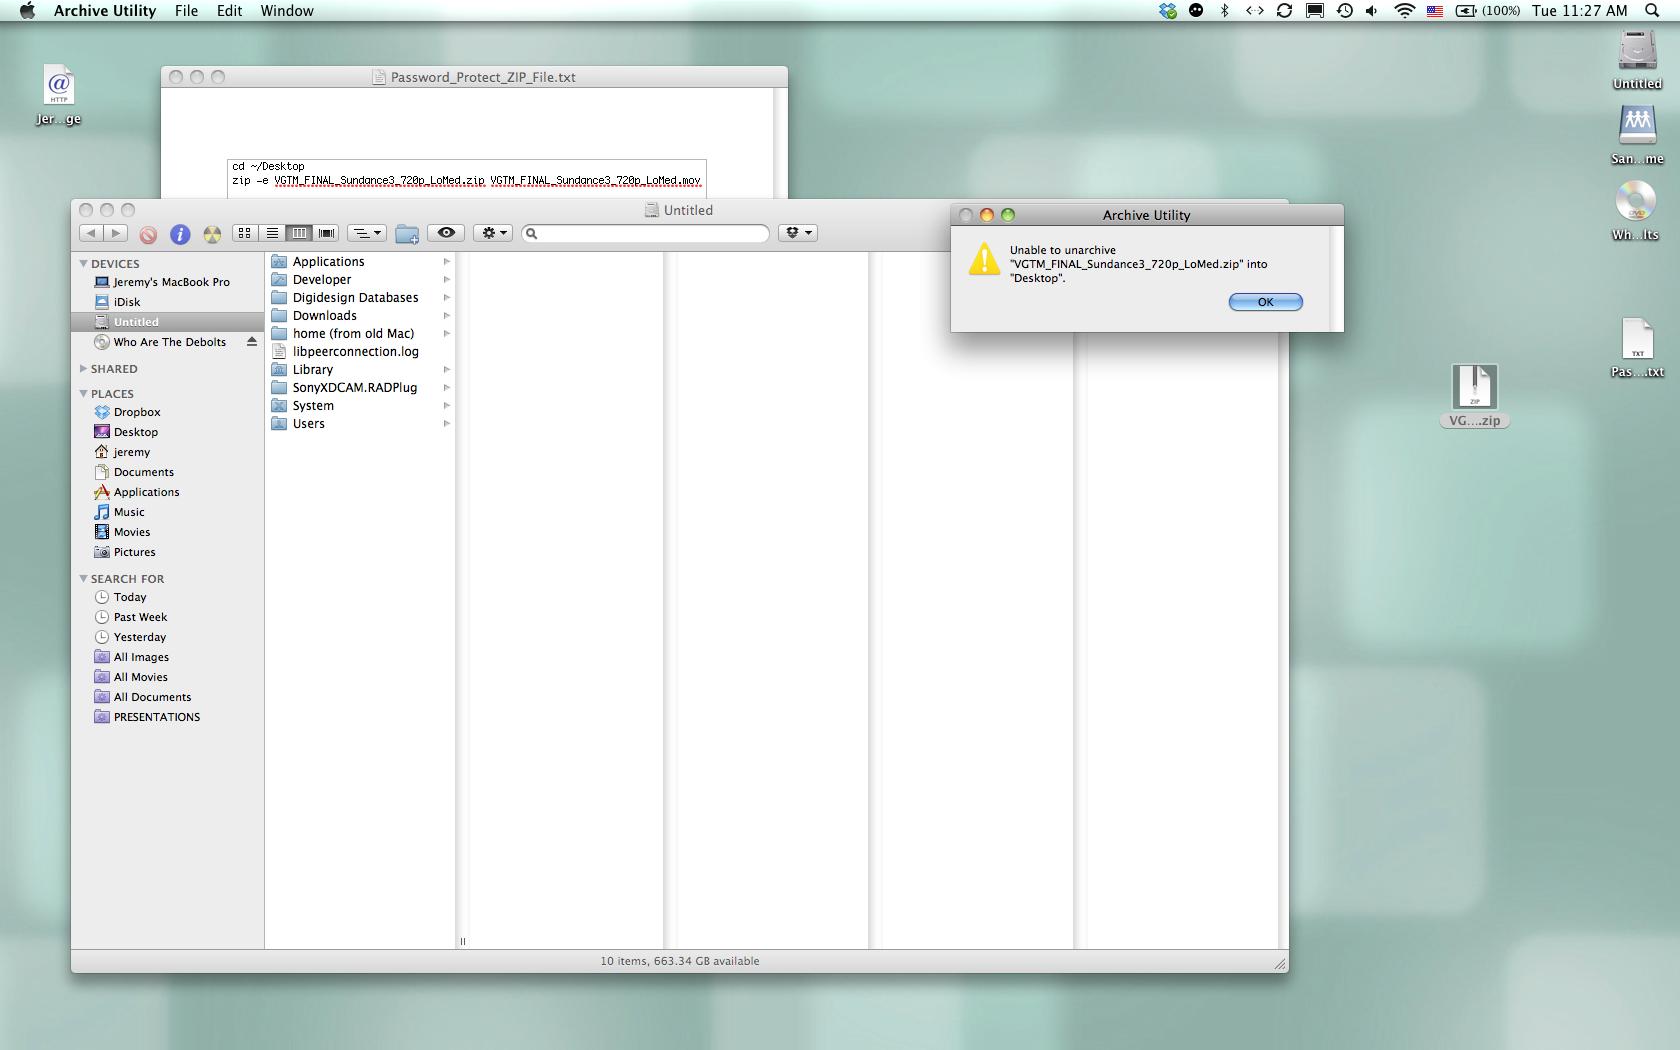 Password protect zip files-Terminal help - Apple Community